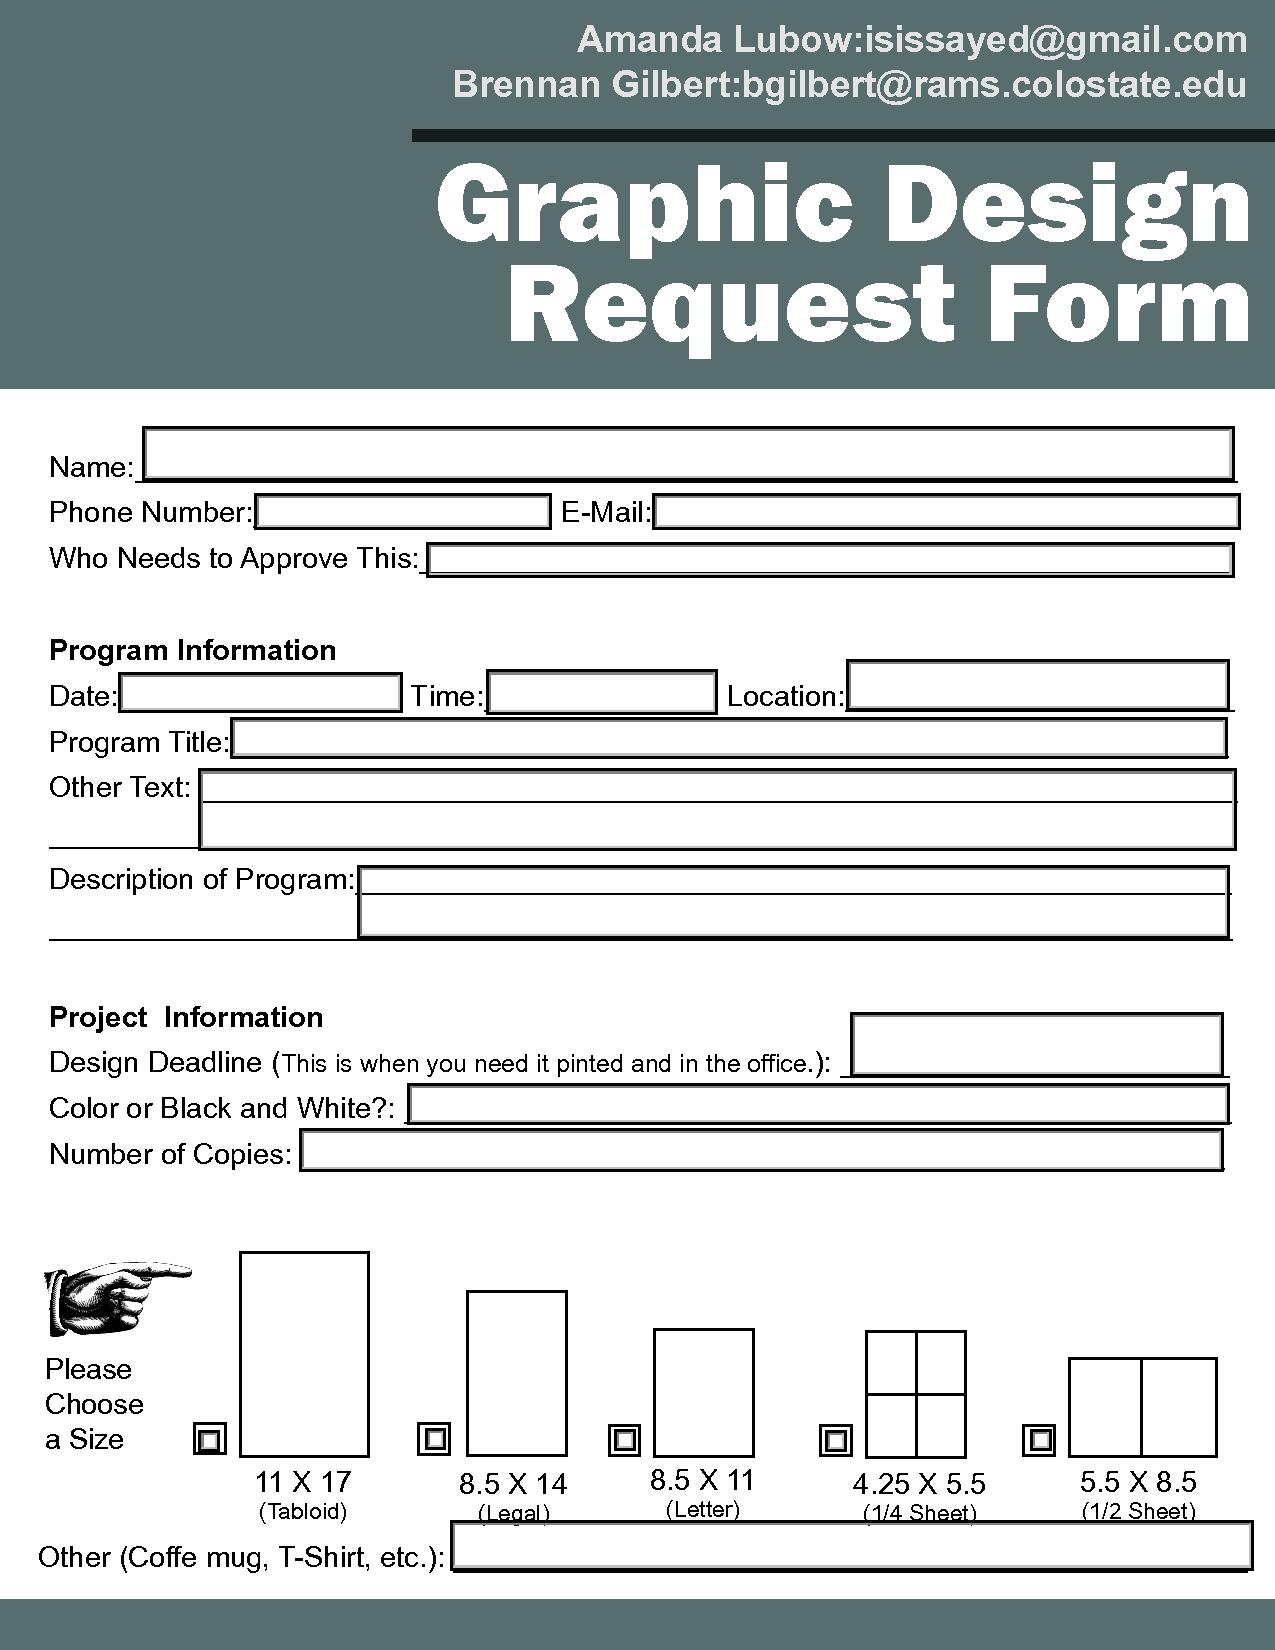 Graphic Design Request Form Template | Design Briefs | Pinterest